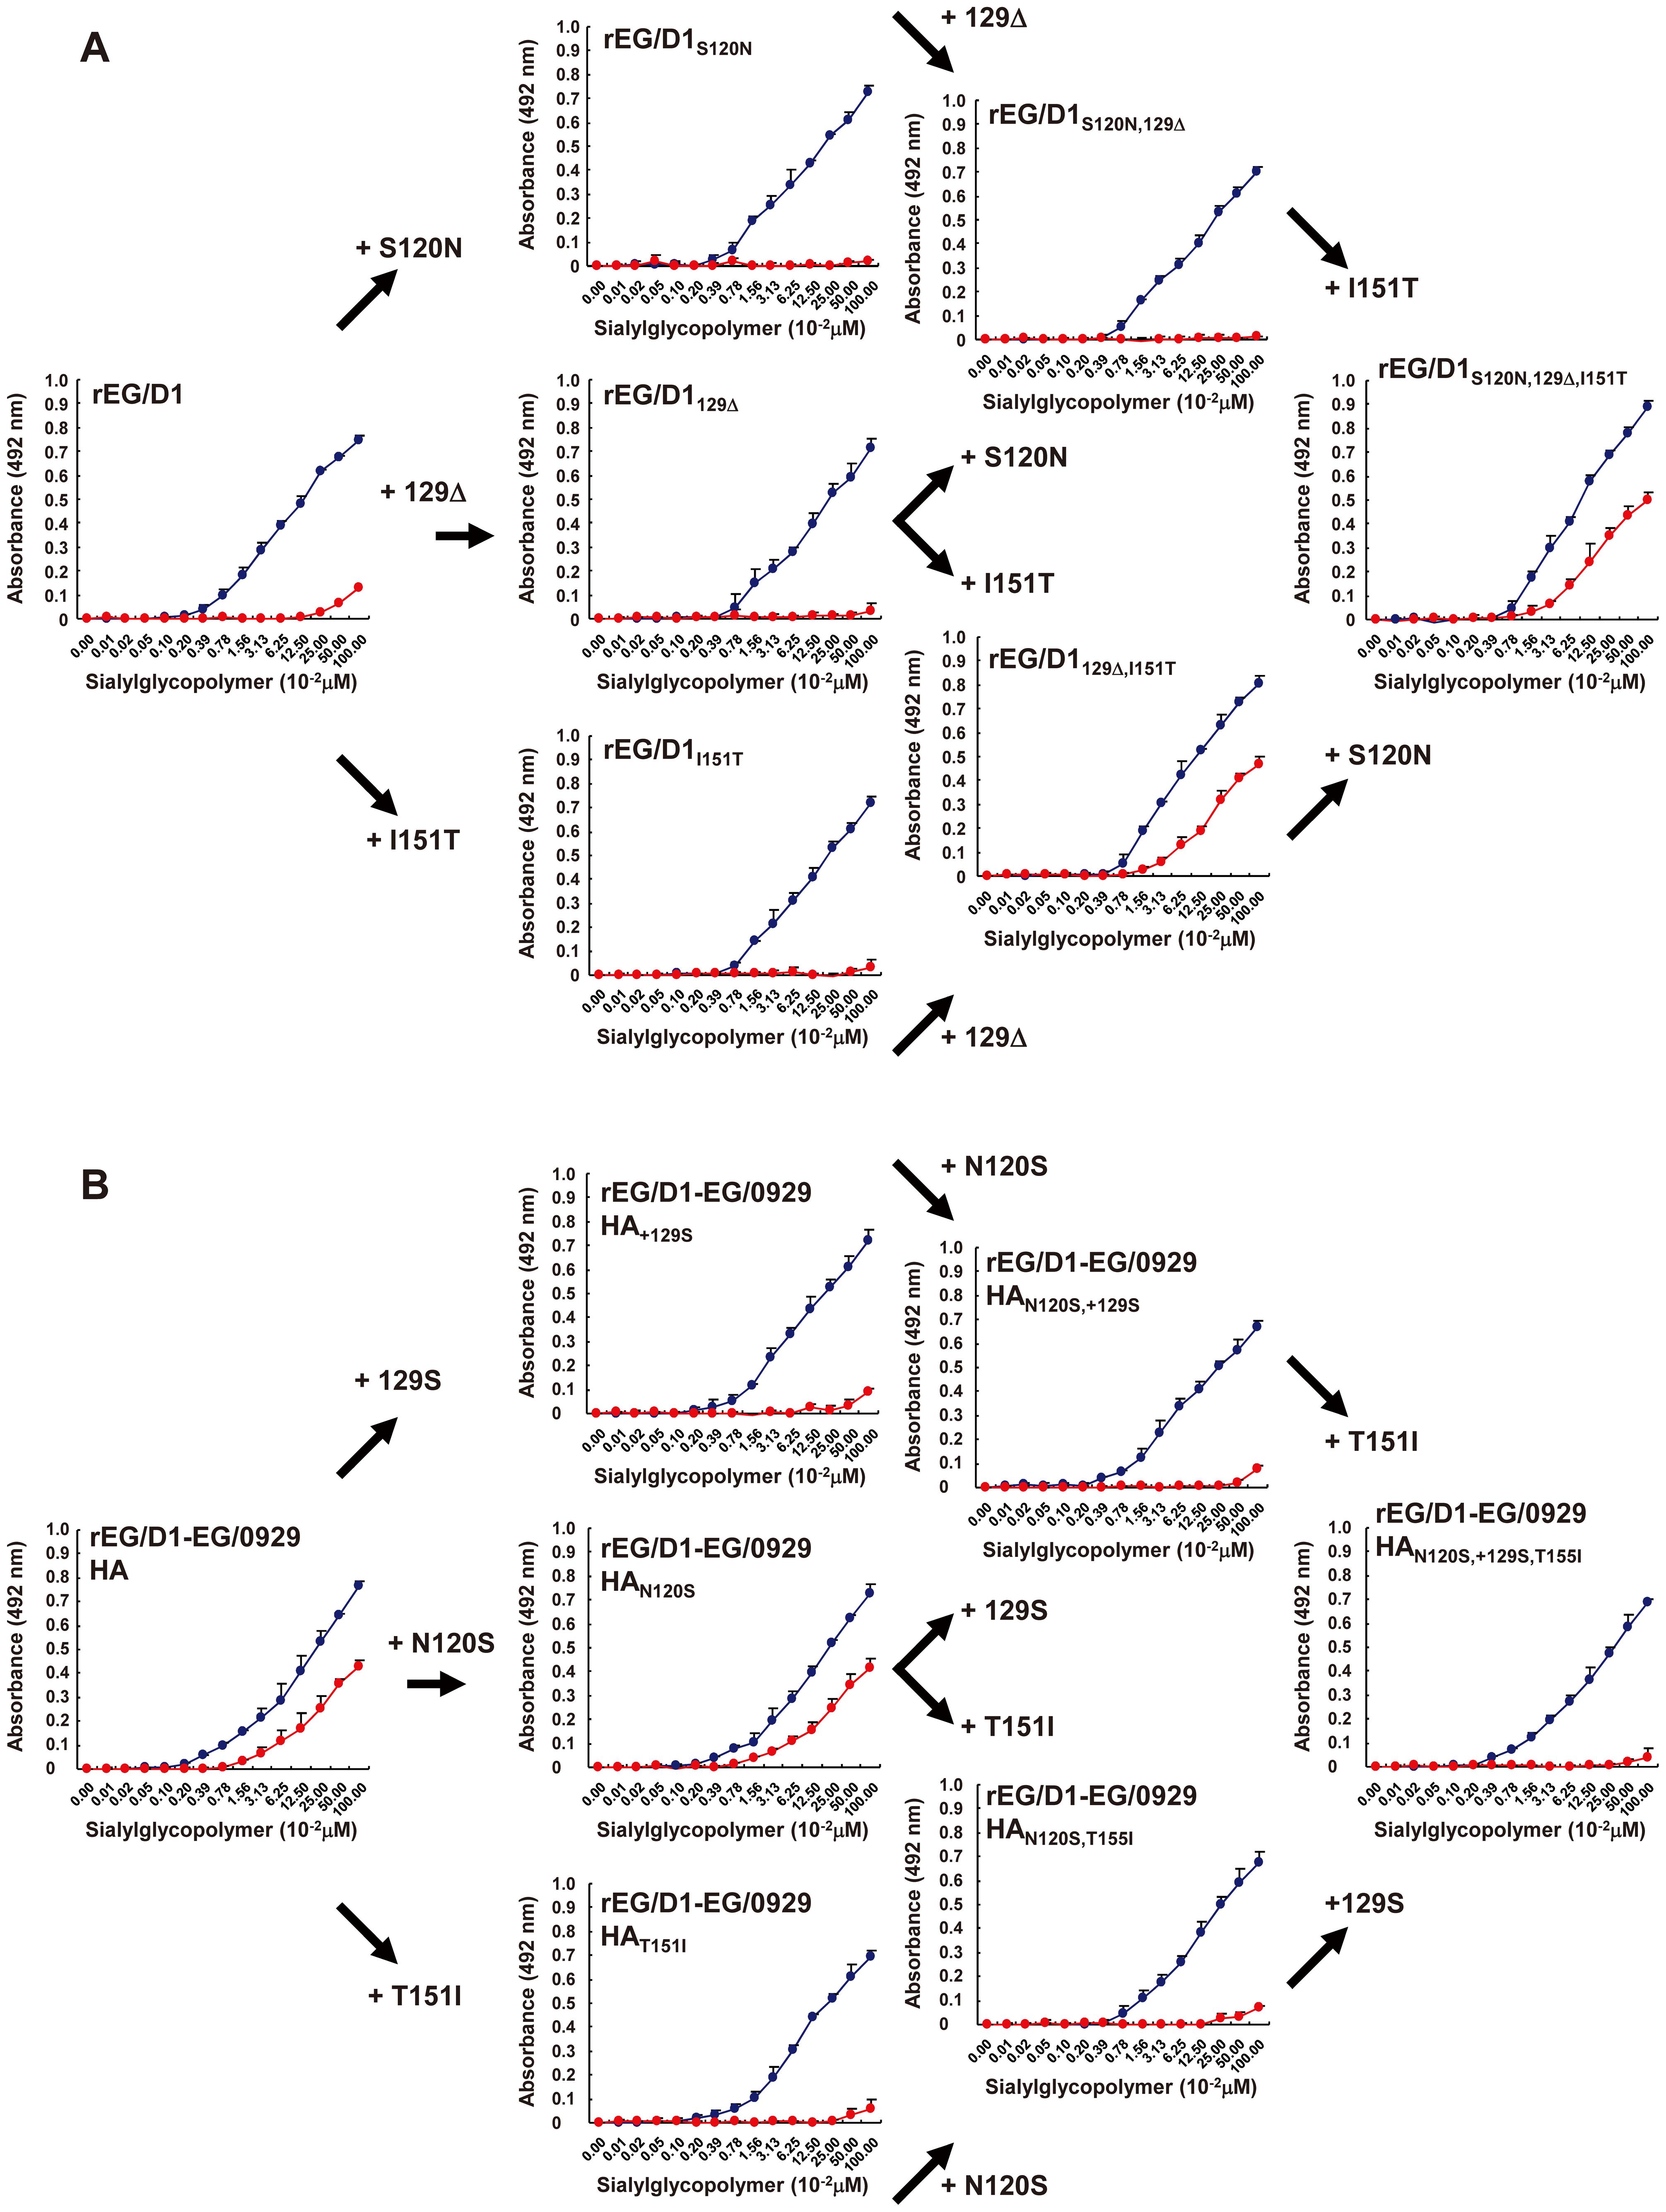 Effect of HA mutations in sublineage BI viruses on receptor specificity of EG/D1 HA.